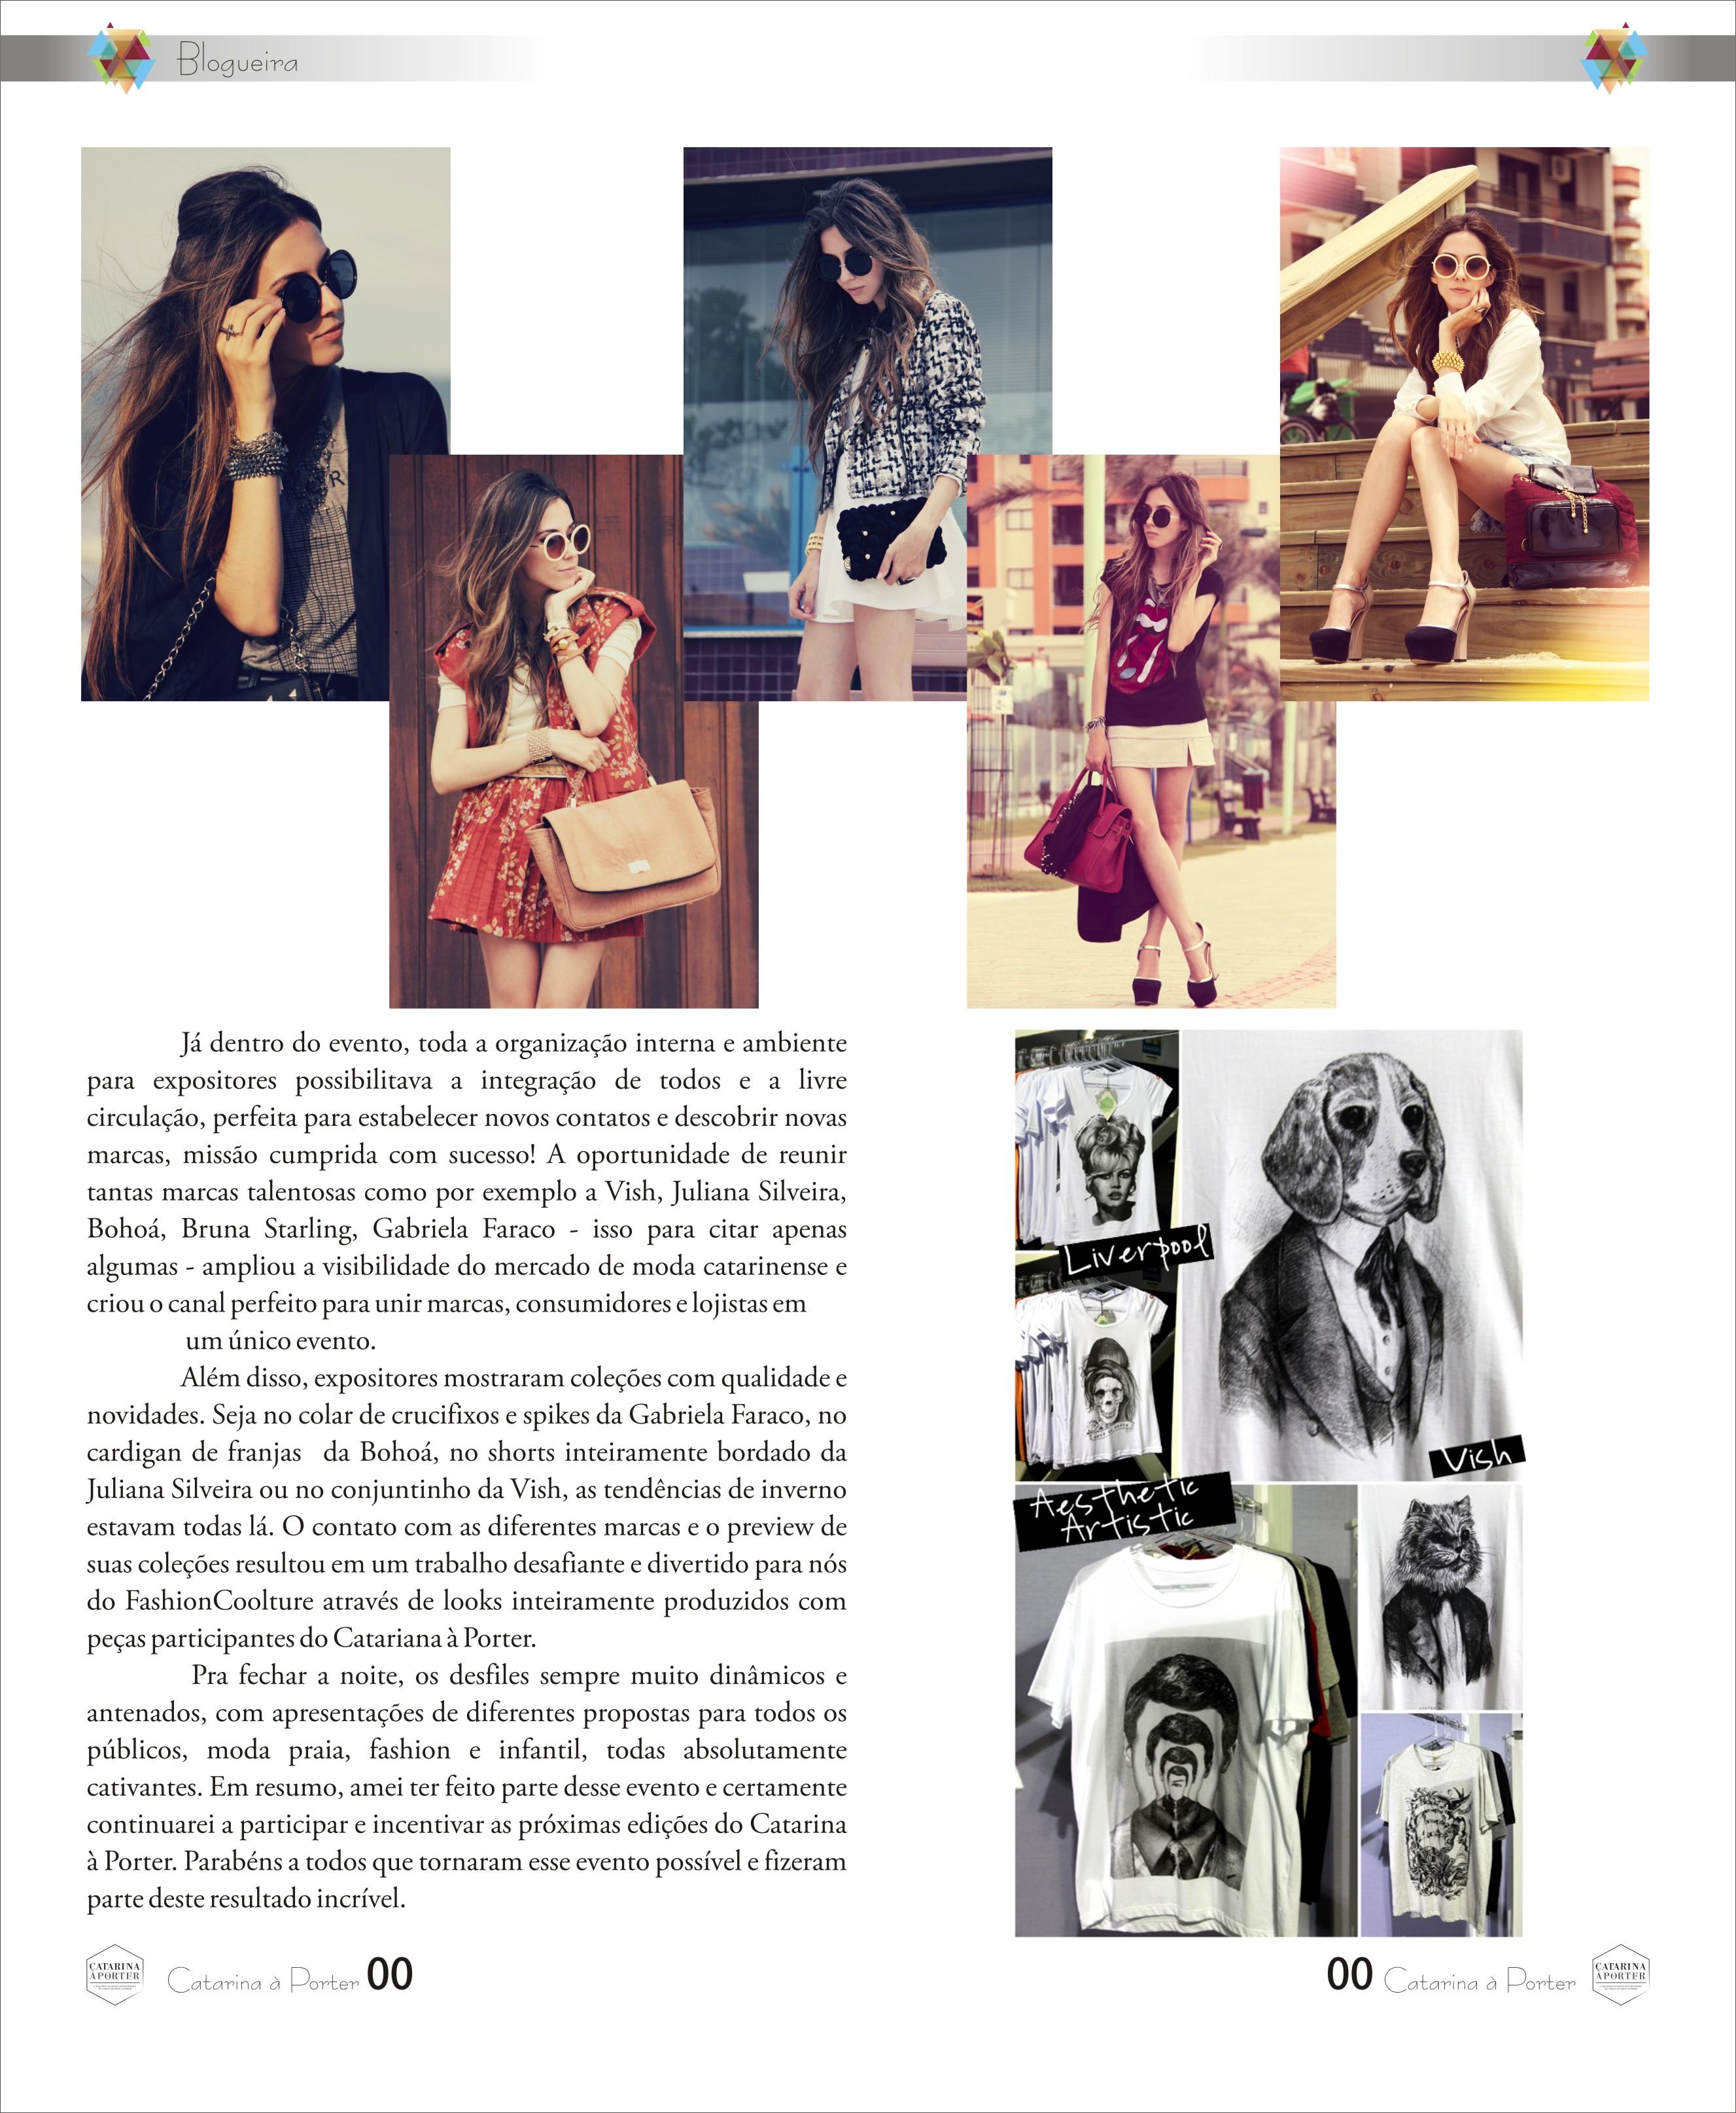 FashionCoolture - Catarina a Porter (5)